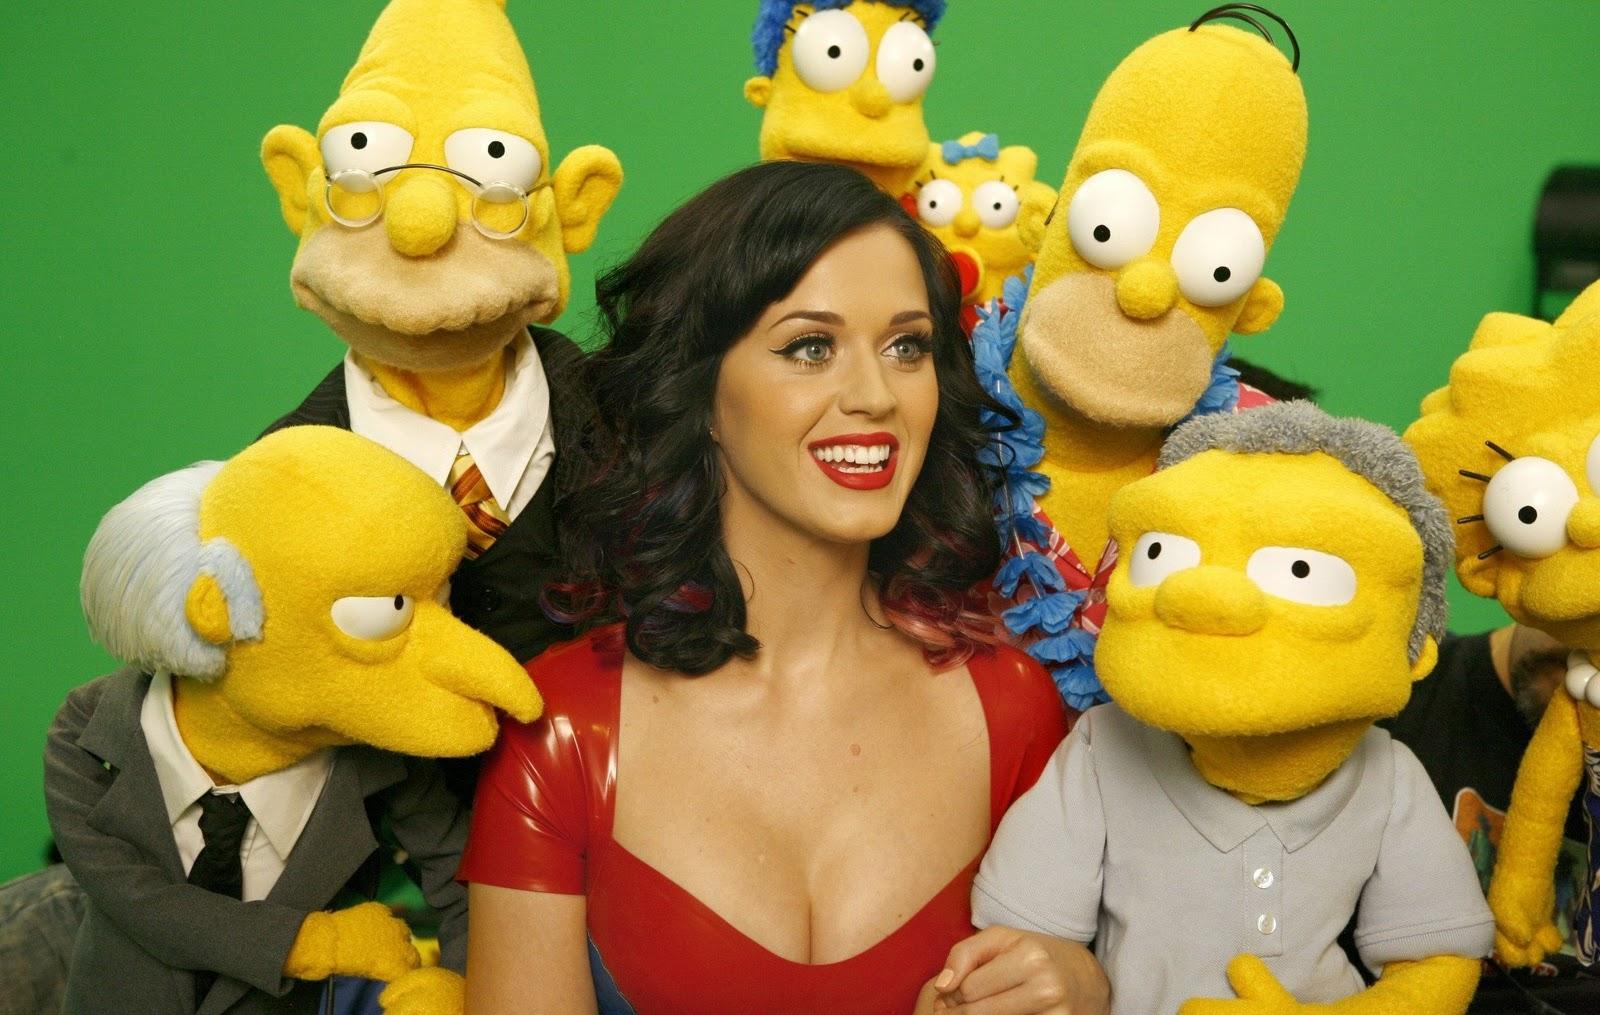 http://3.bp.blogspot.com/_z9OIyJxLgSU/TOg9X7Pw91I/AAAAAAAAJ_0/CW5XfSpBsiE/s1600/Katy-Perry-56.jpg